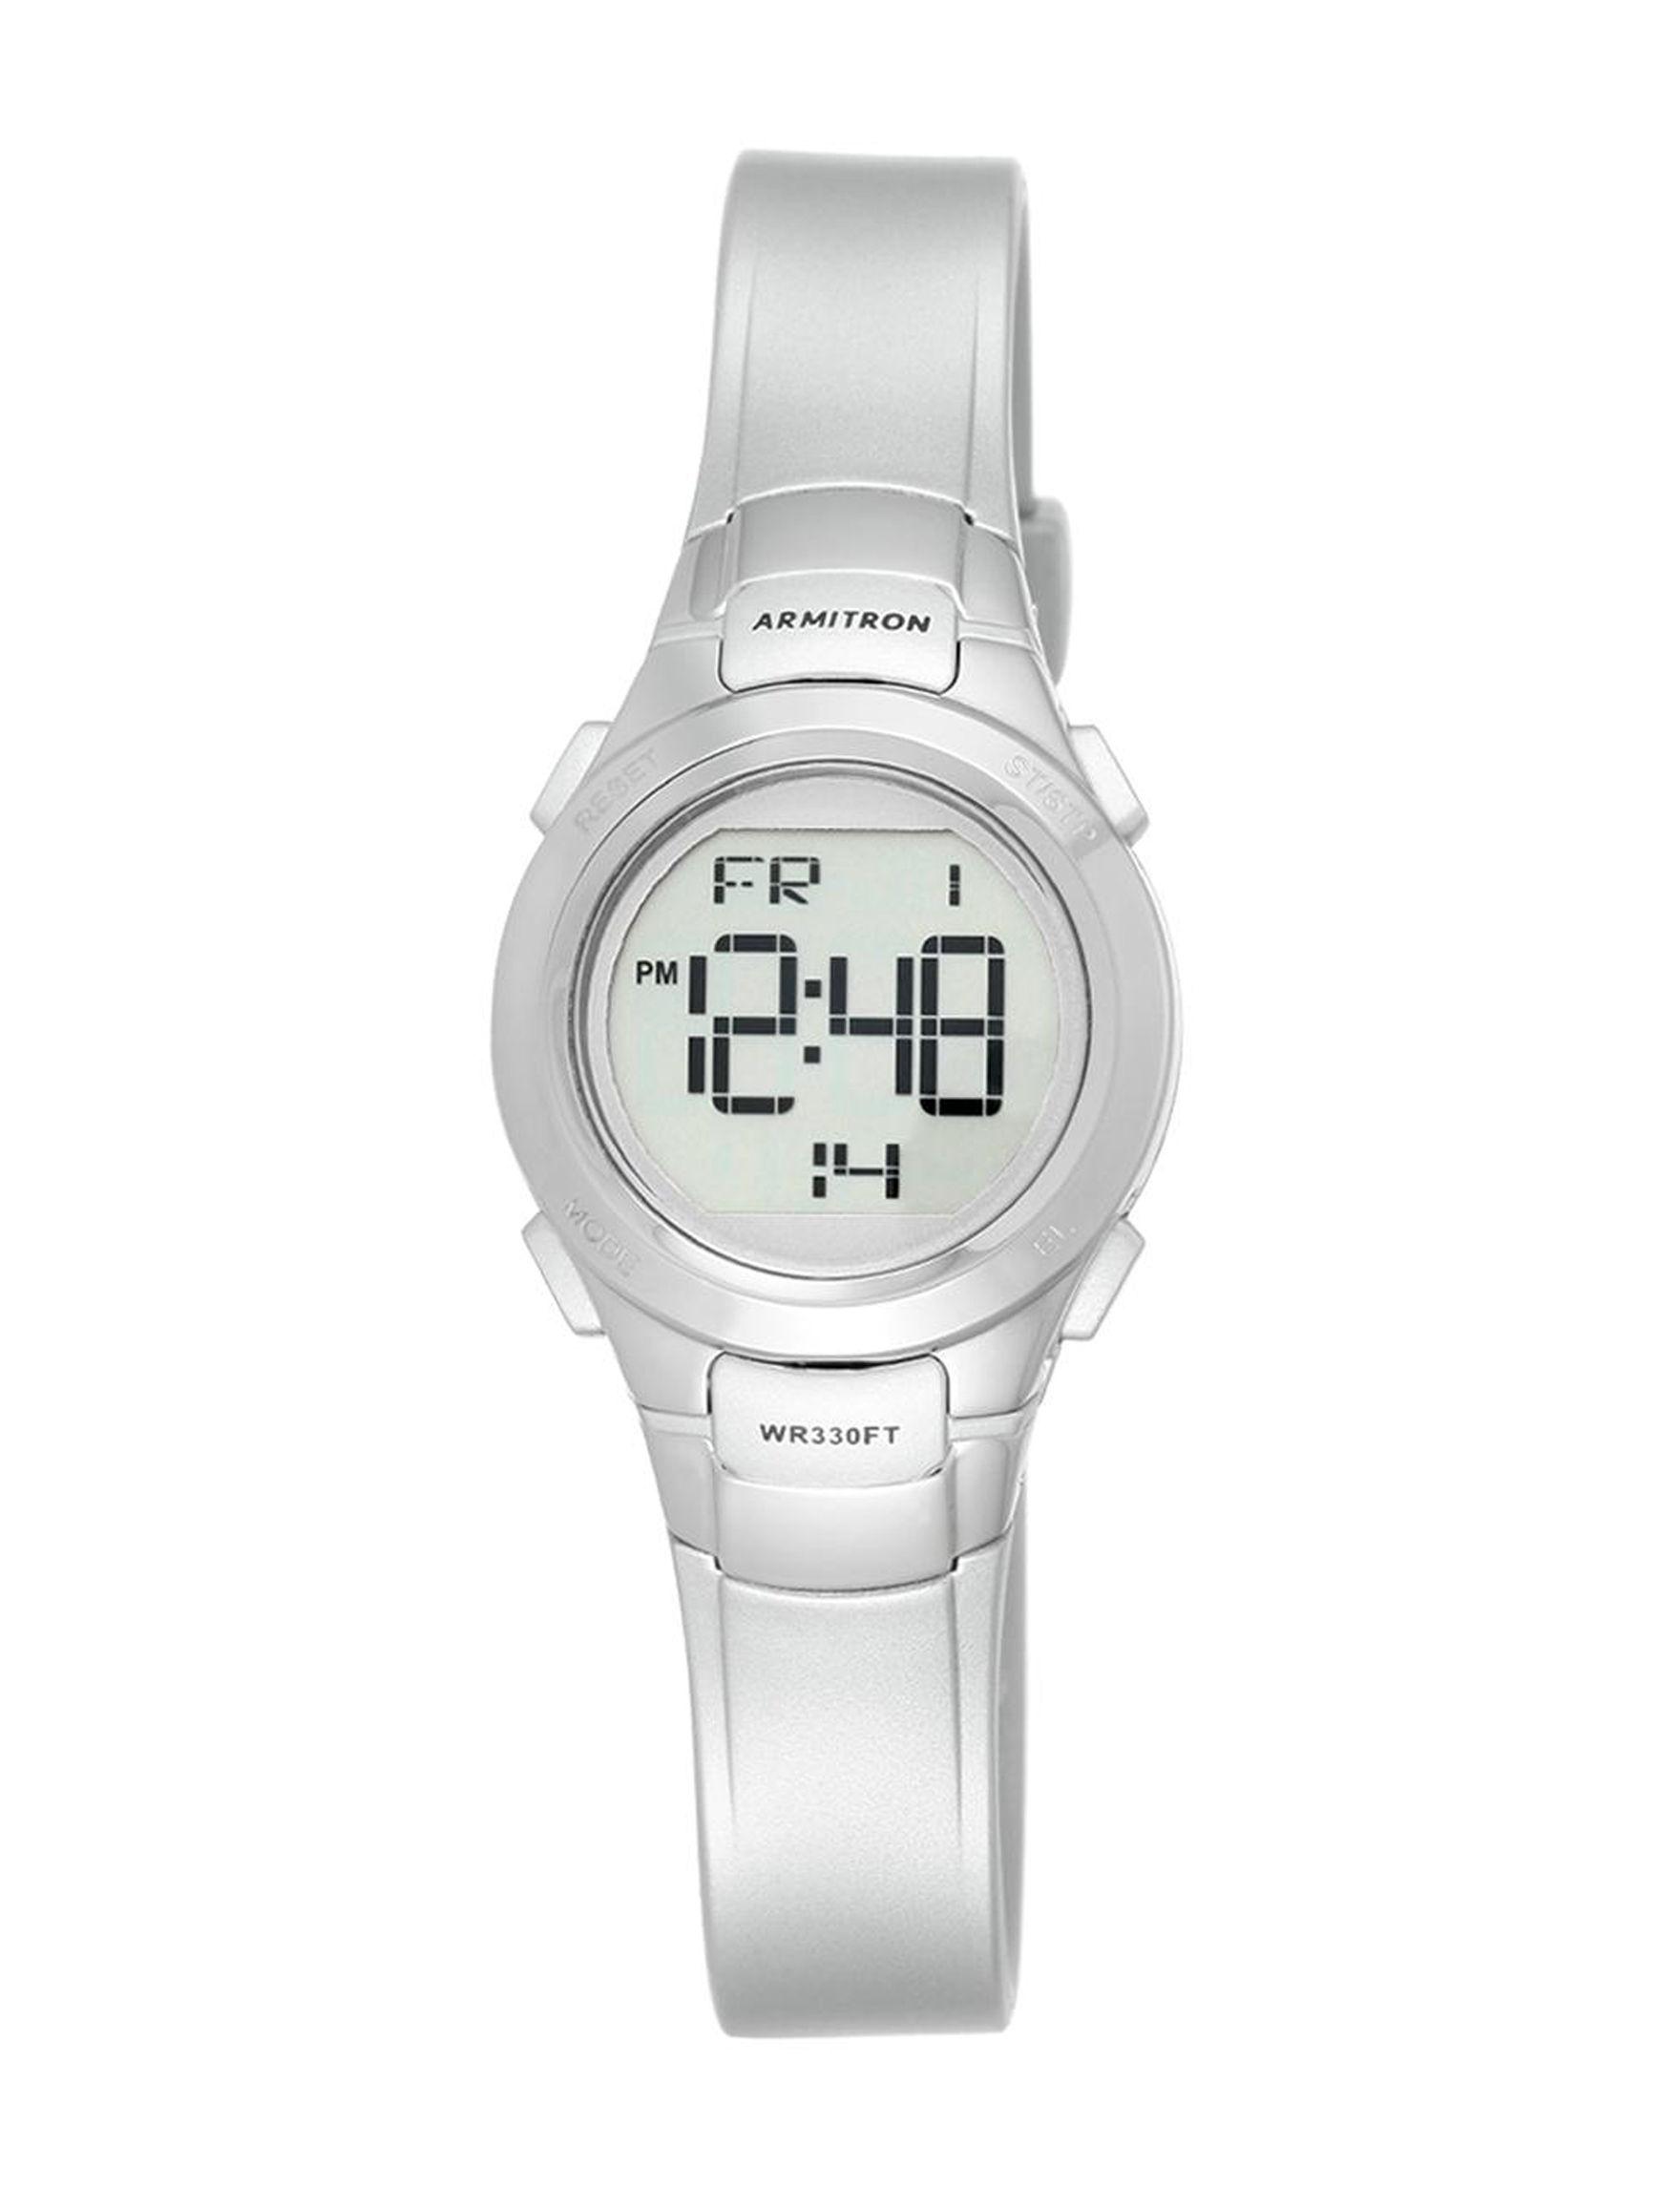 Armitron Silver Sport Watches